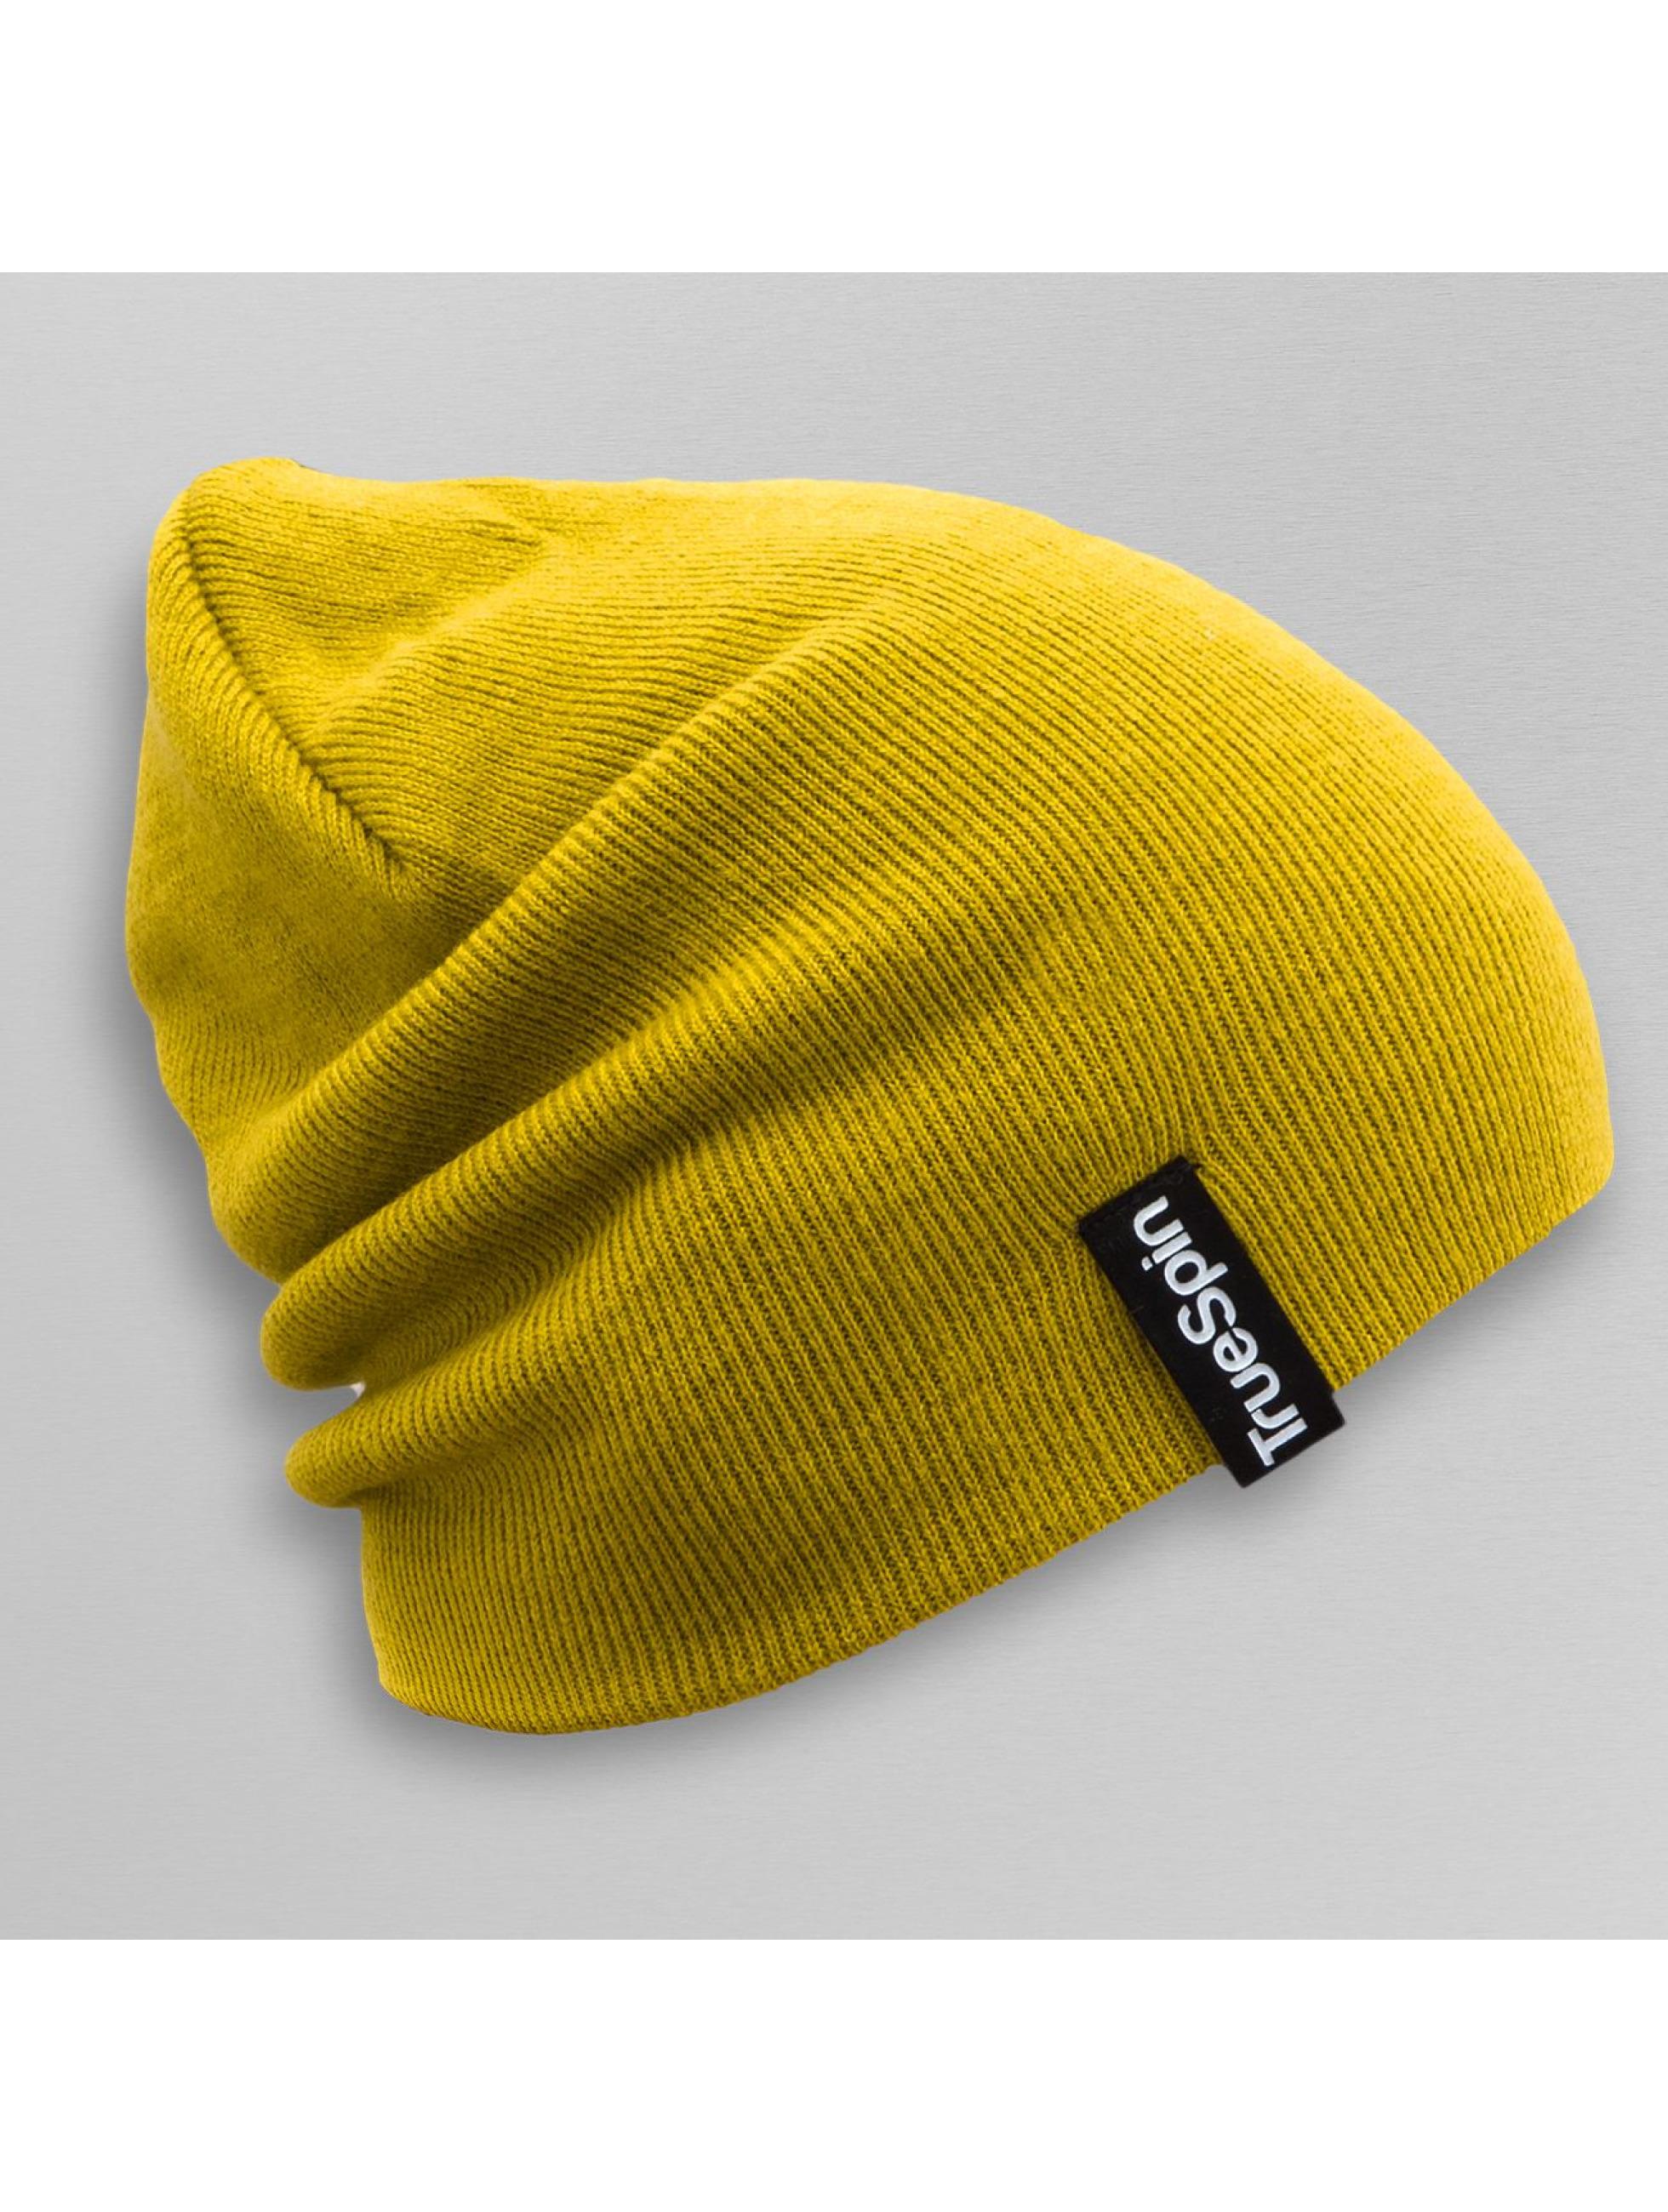 Beanie Basic Style in gelb